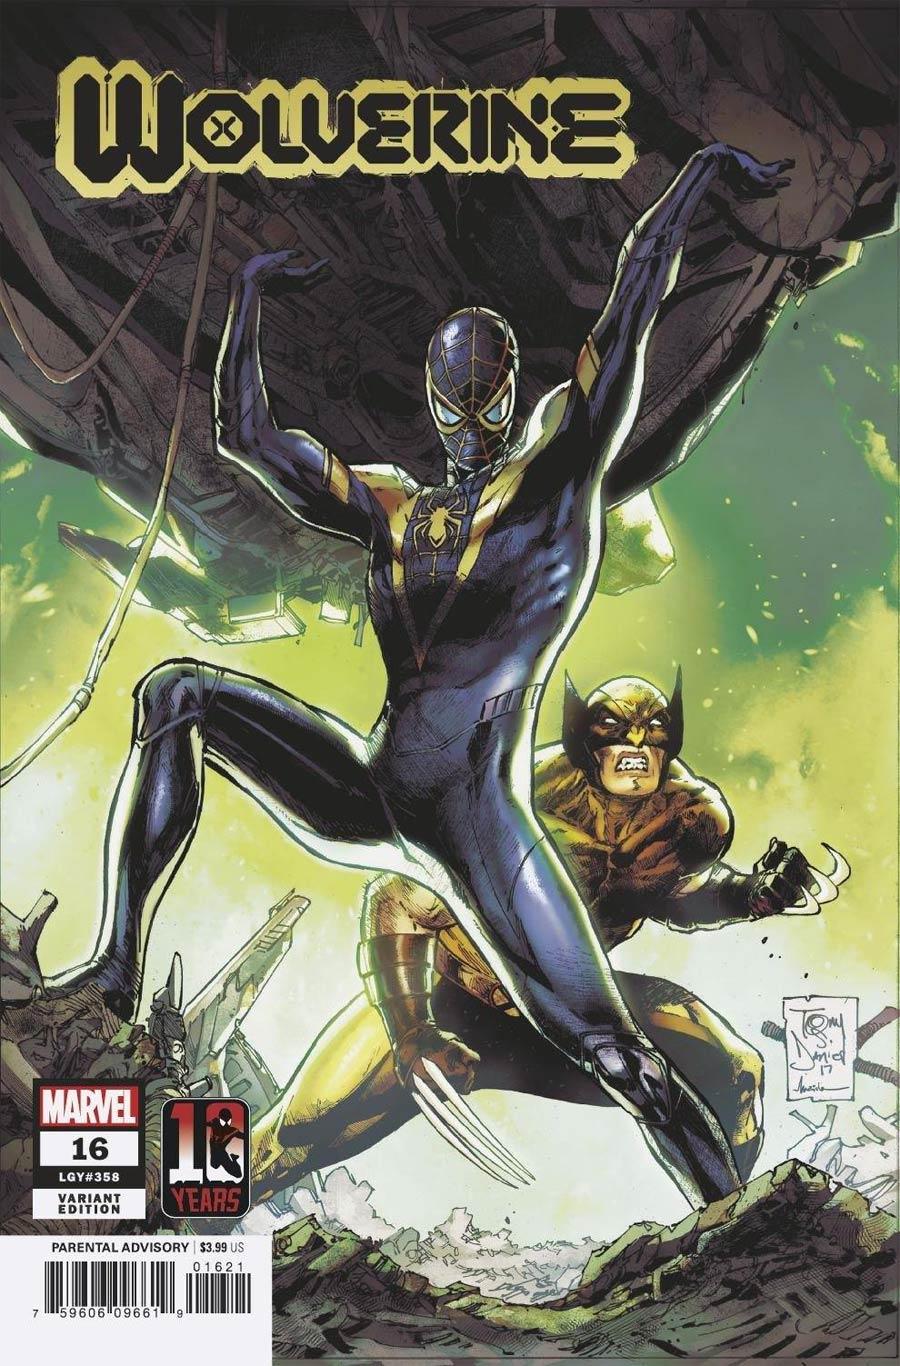 Wolverine Vol 7 #16 Cover B Variant Tony Daniel Miles Morales Spider-Man 10th Anniversary Cover